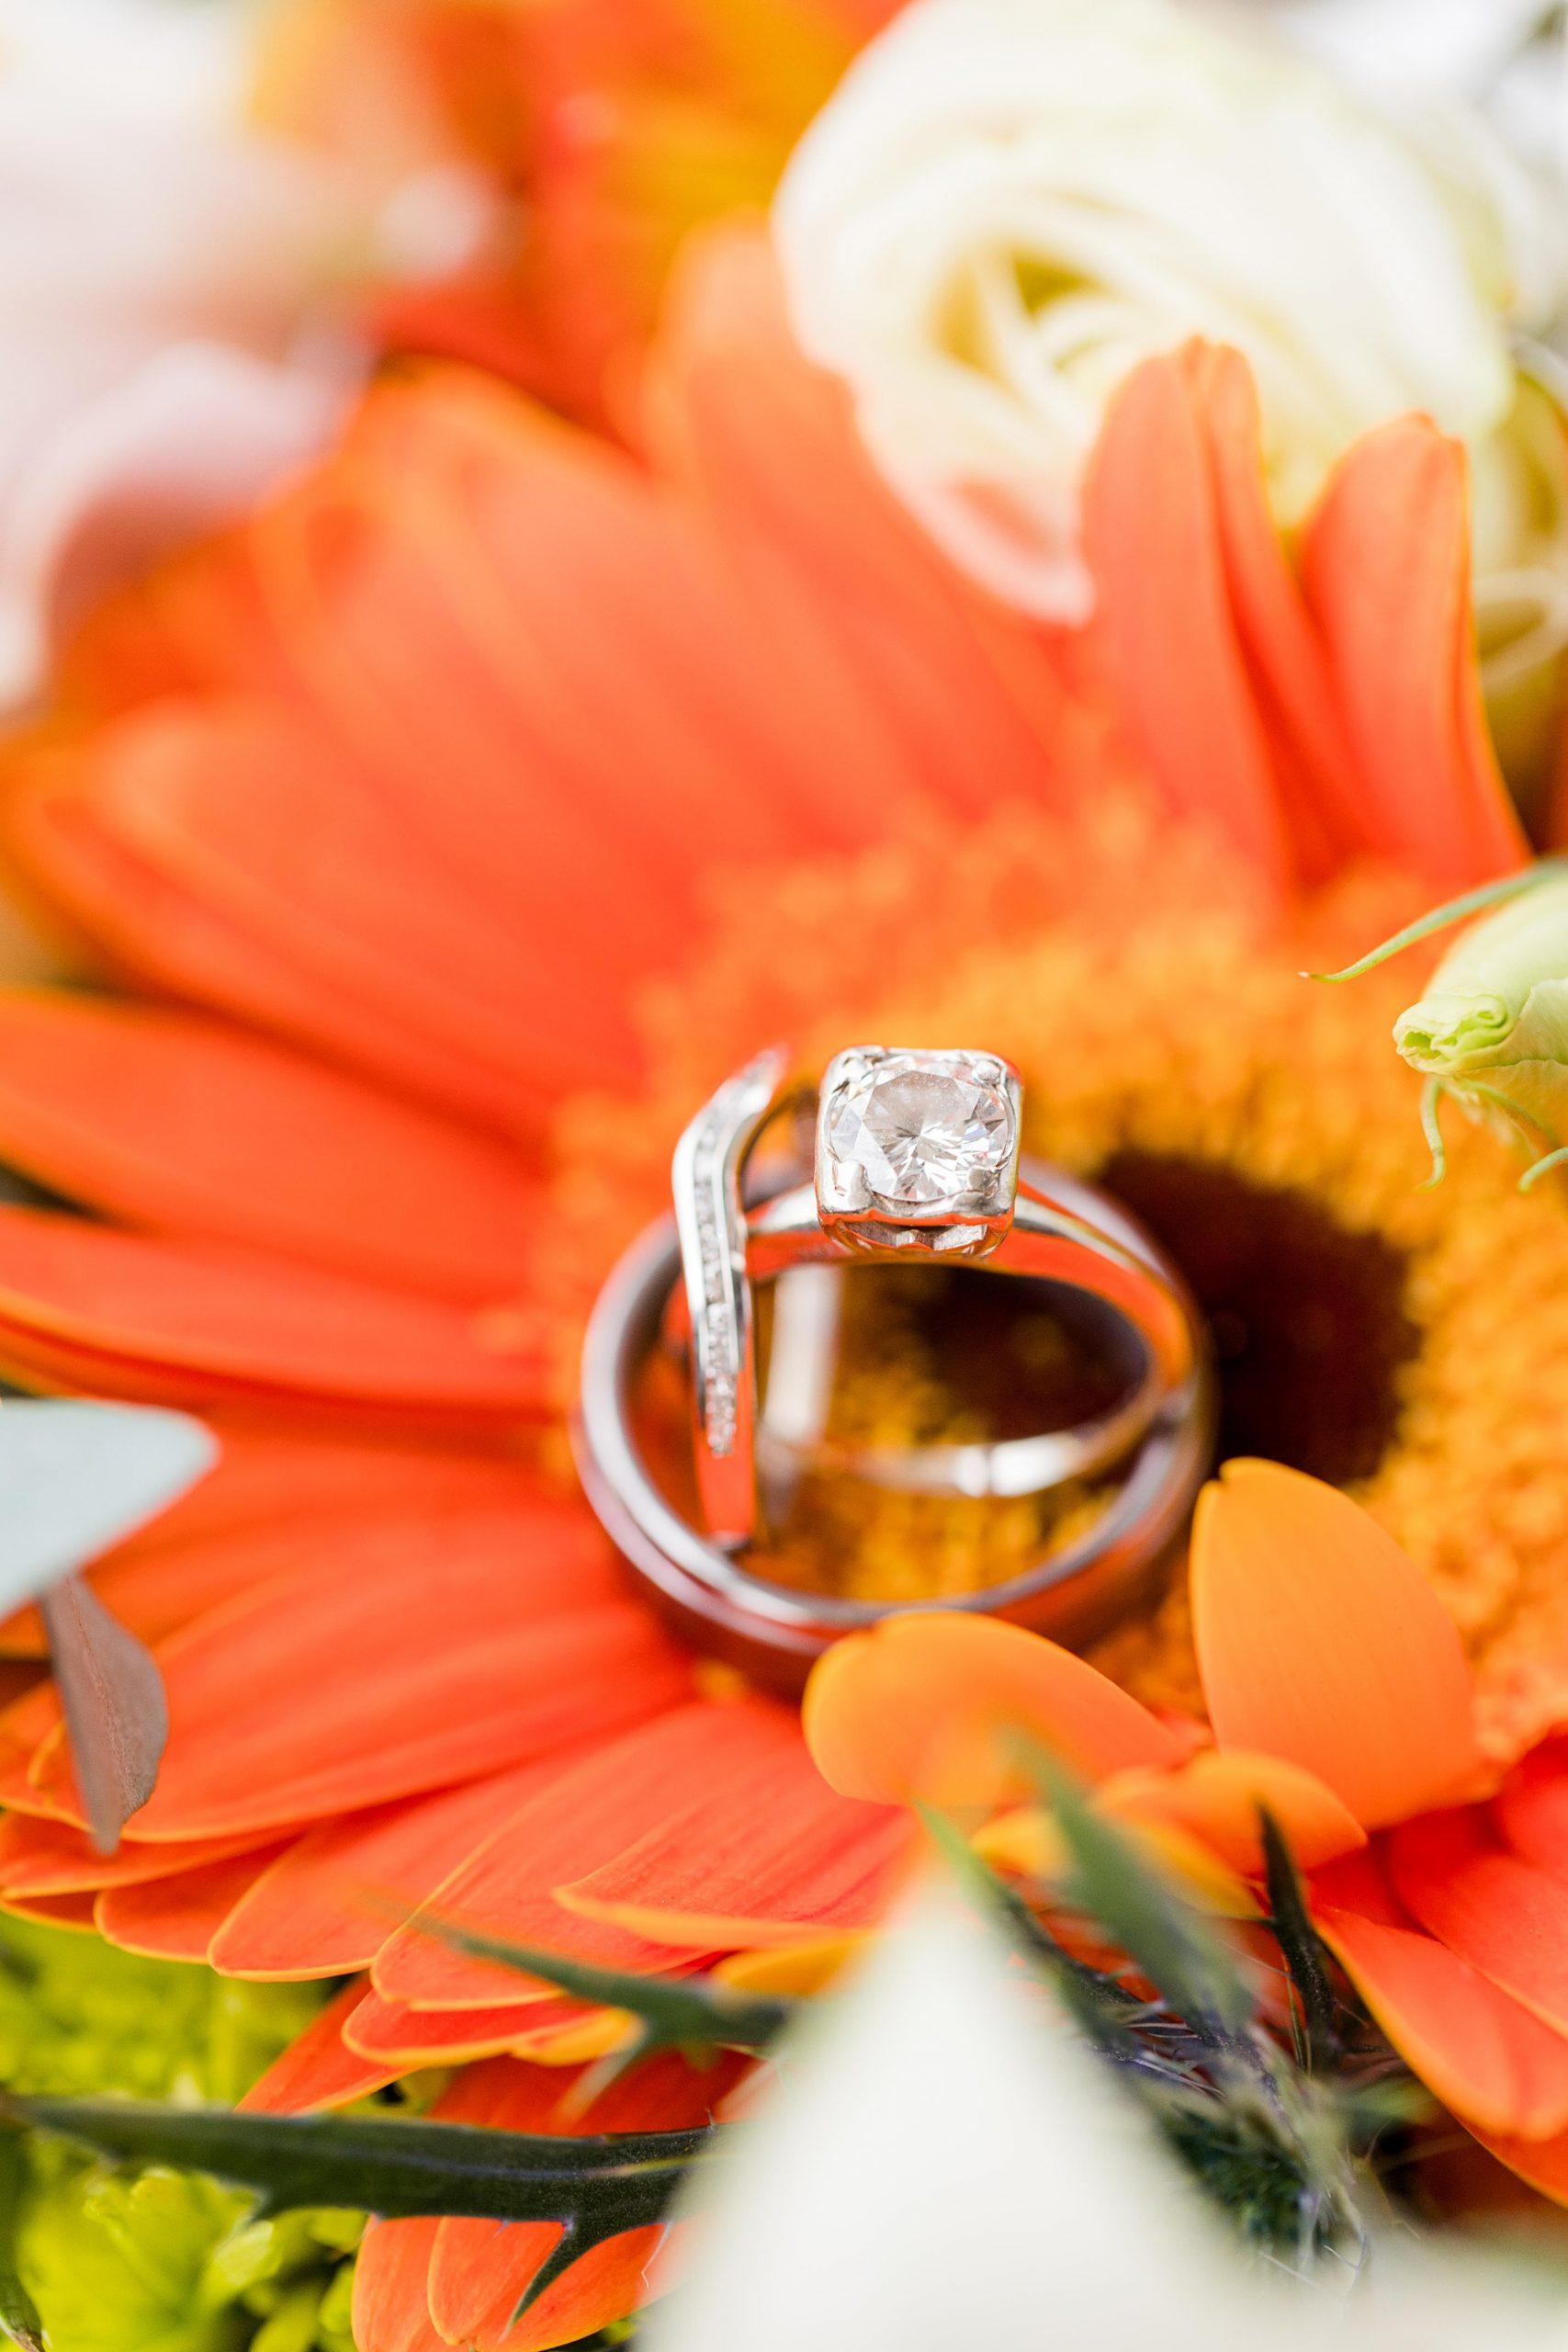 wedding rings rest on orange daises